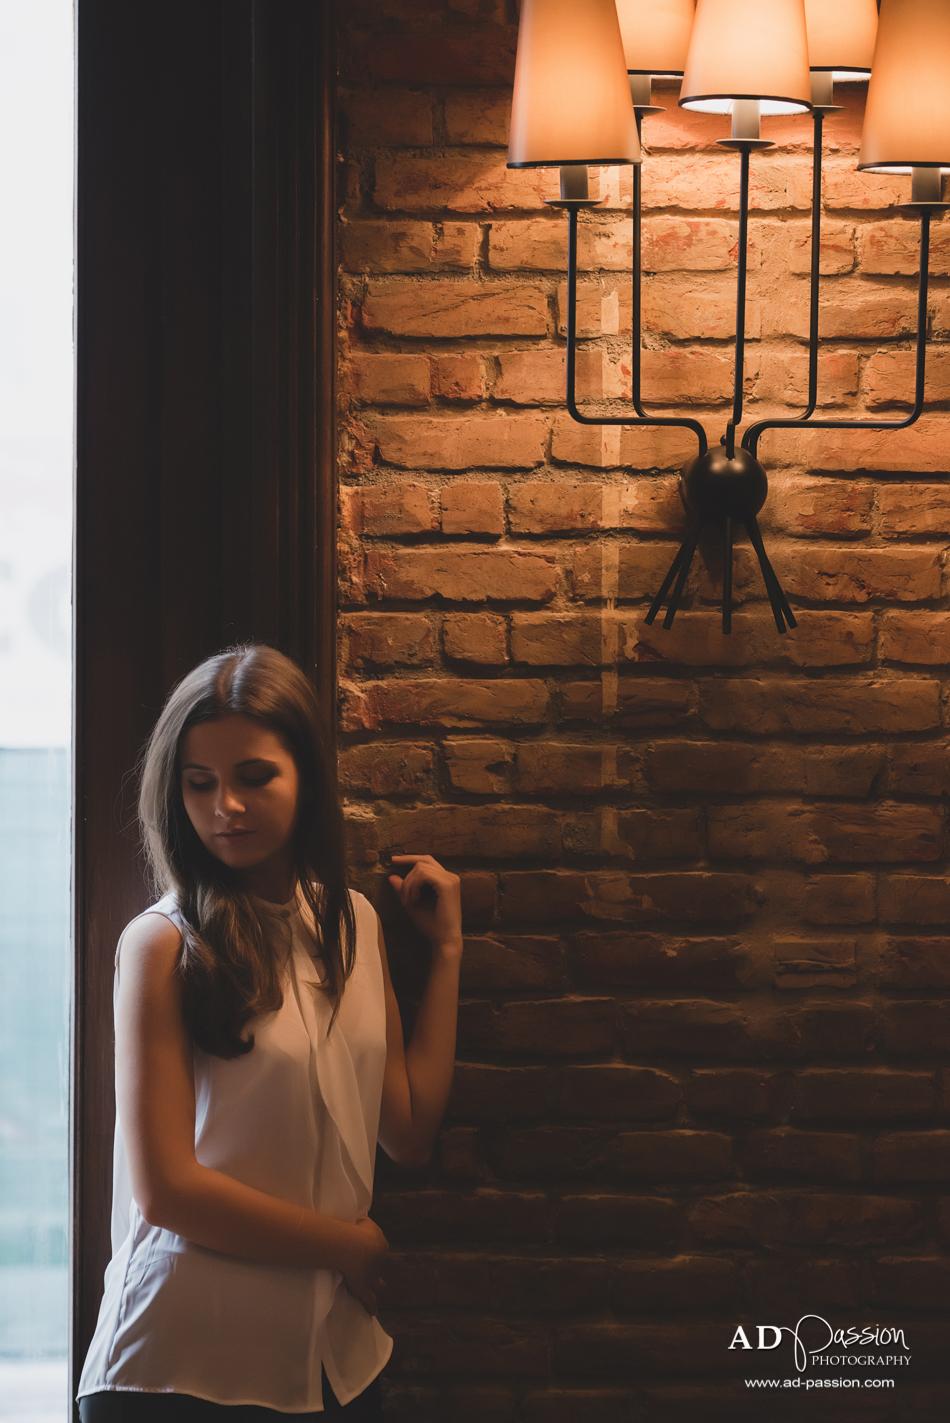 AD Passion Photography | rahela_fotografie-portret-timisoara_0019 | Adelin, Dida, fotograf profesionist, fotograf de nunta, fotografie de nunta, fotograf Timisoara, fotograf Craiova, fotograf Bucuresti, fotograf Arad, nunta Timisoara, nunta Arad, nunta Bucuresti, nunta Craiova